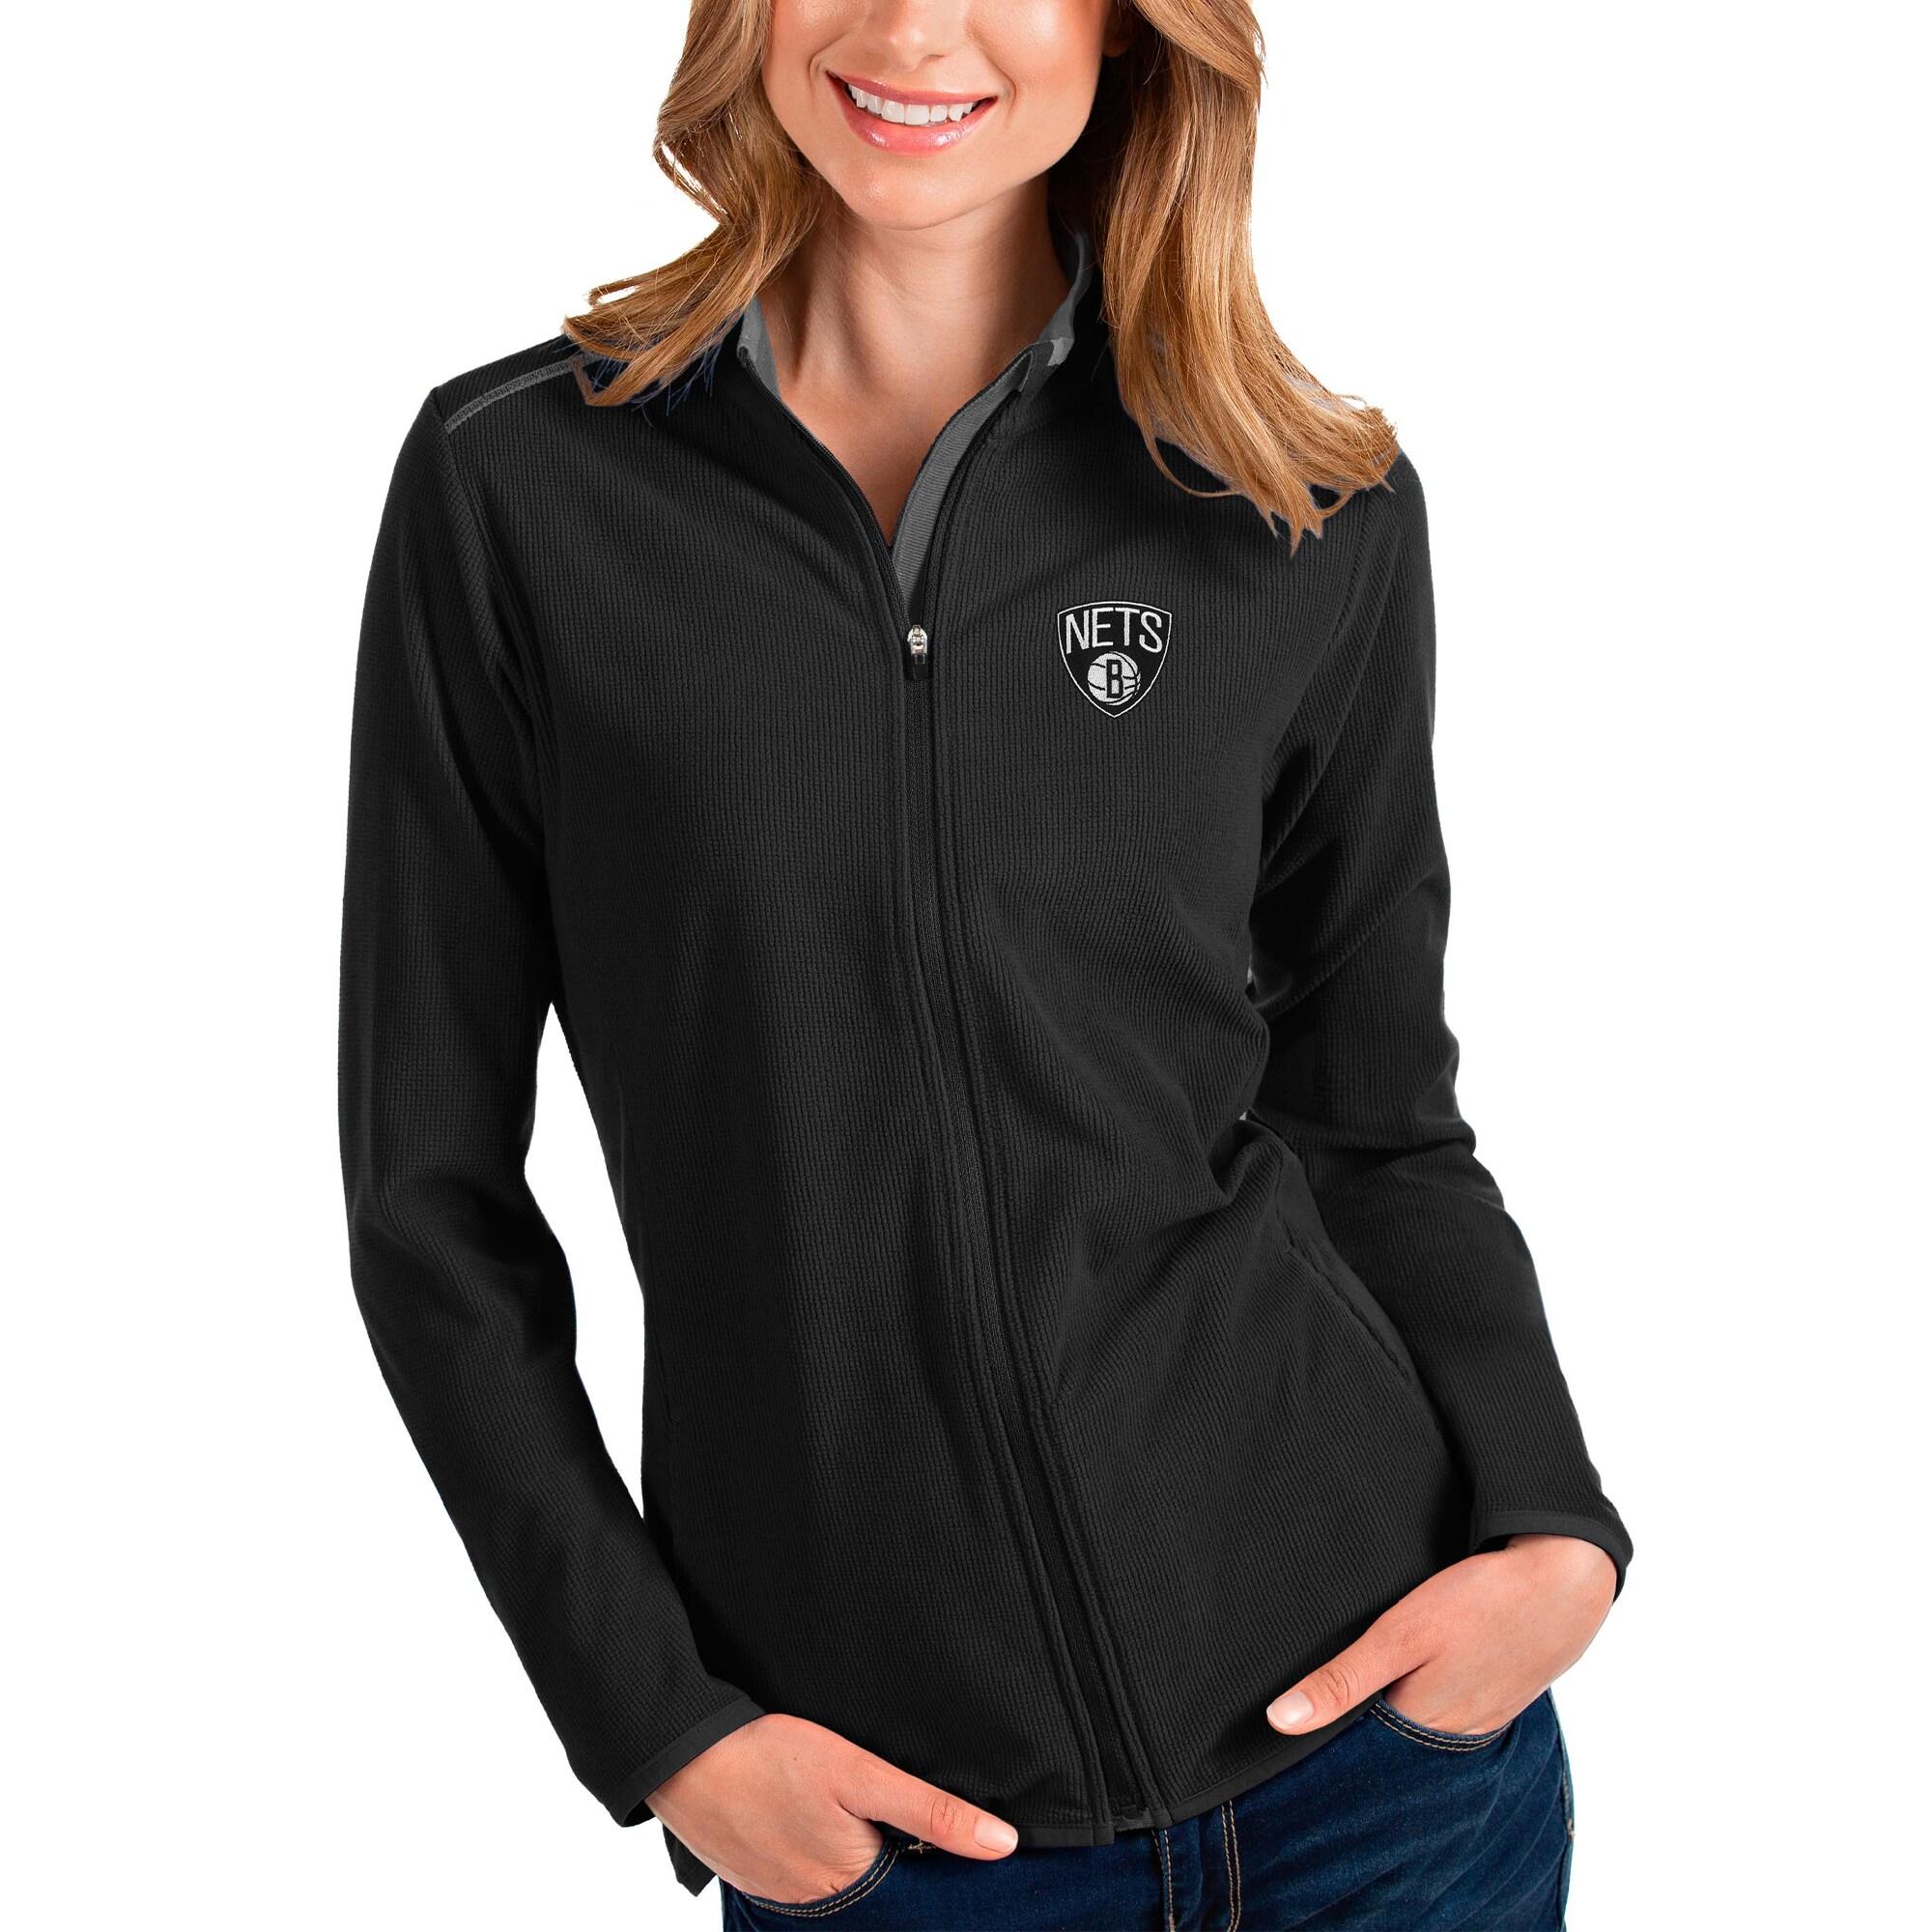 Brooklyn Nets Antigua Women's Glacier Full-Zip Jacket - Black/Gray